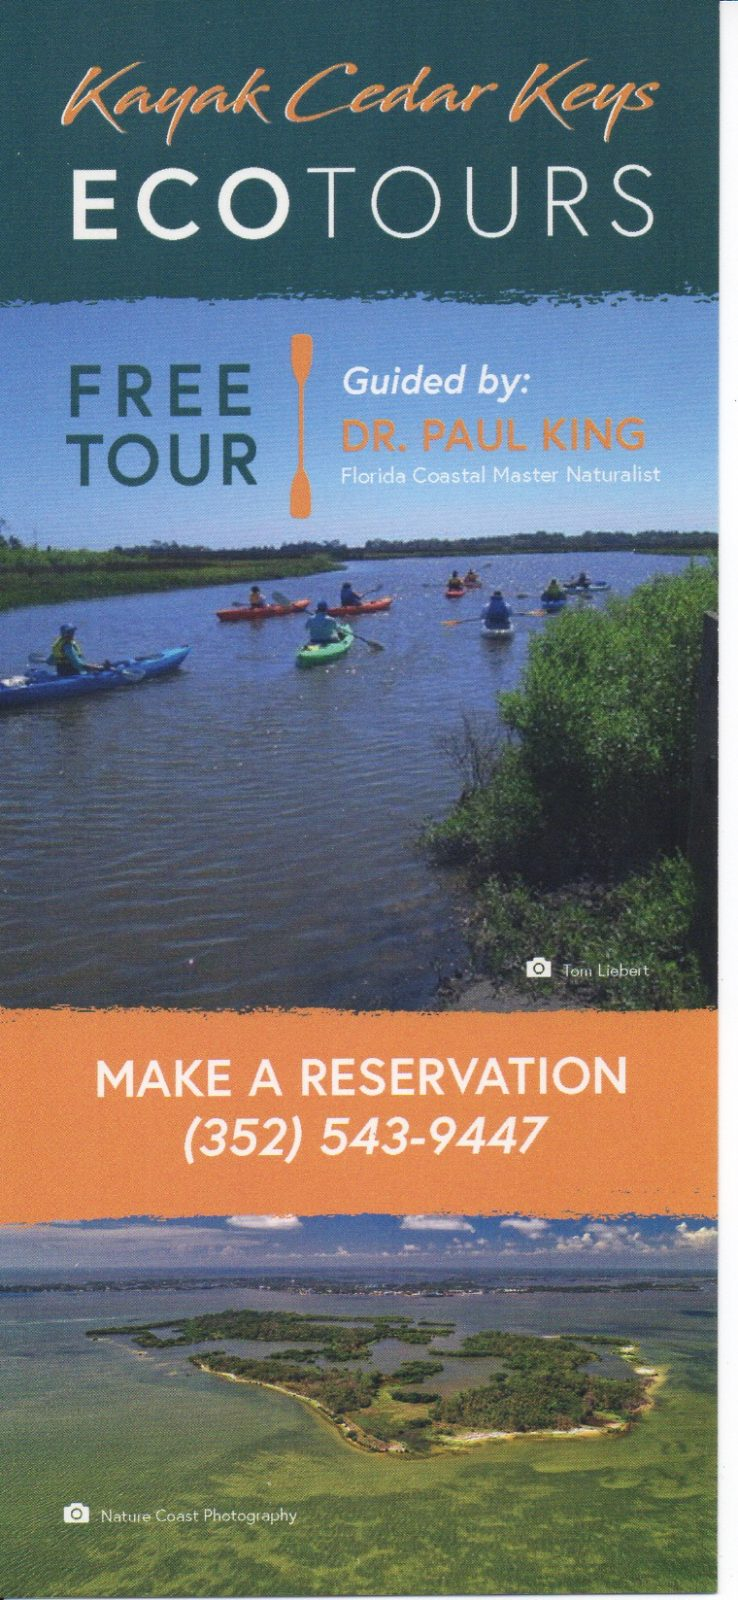 Free* Kayak Eco Tours at Cedar Key